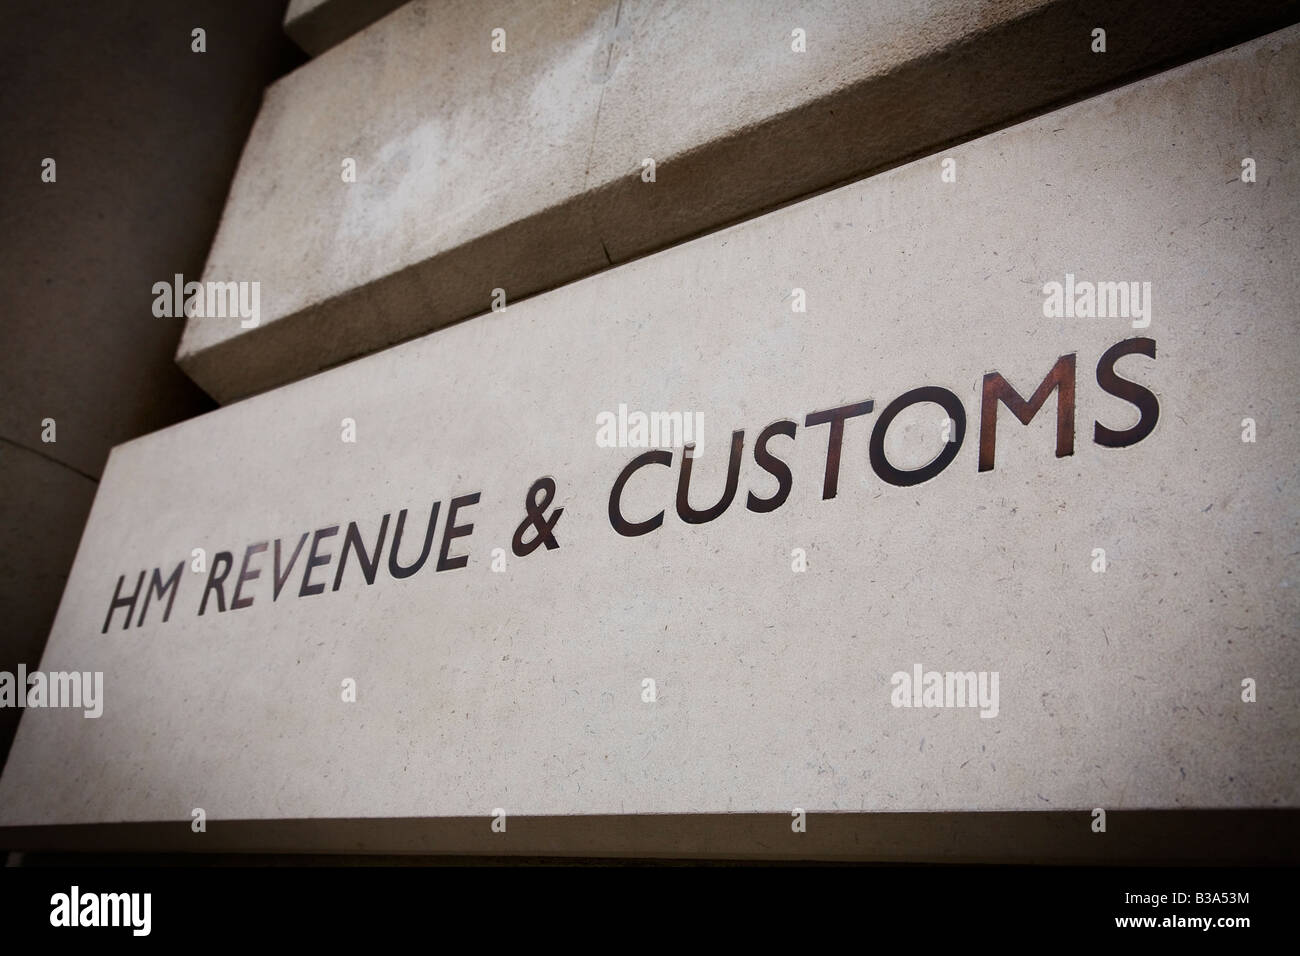 HM Revenue Customs building on Whitehall London UK - Stock Image